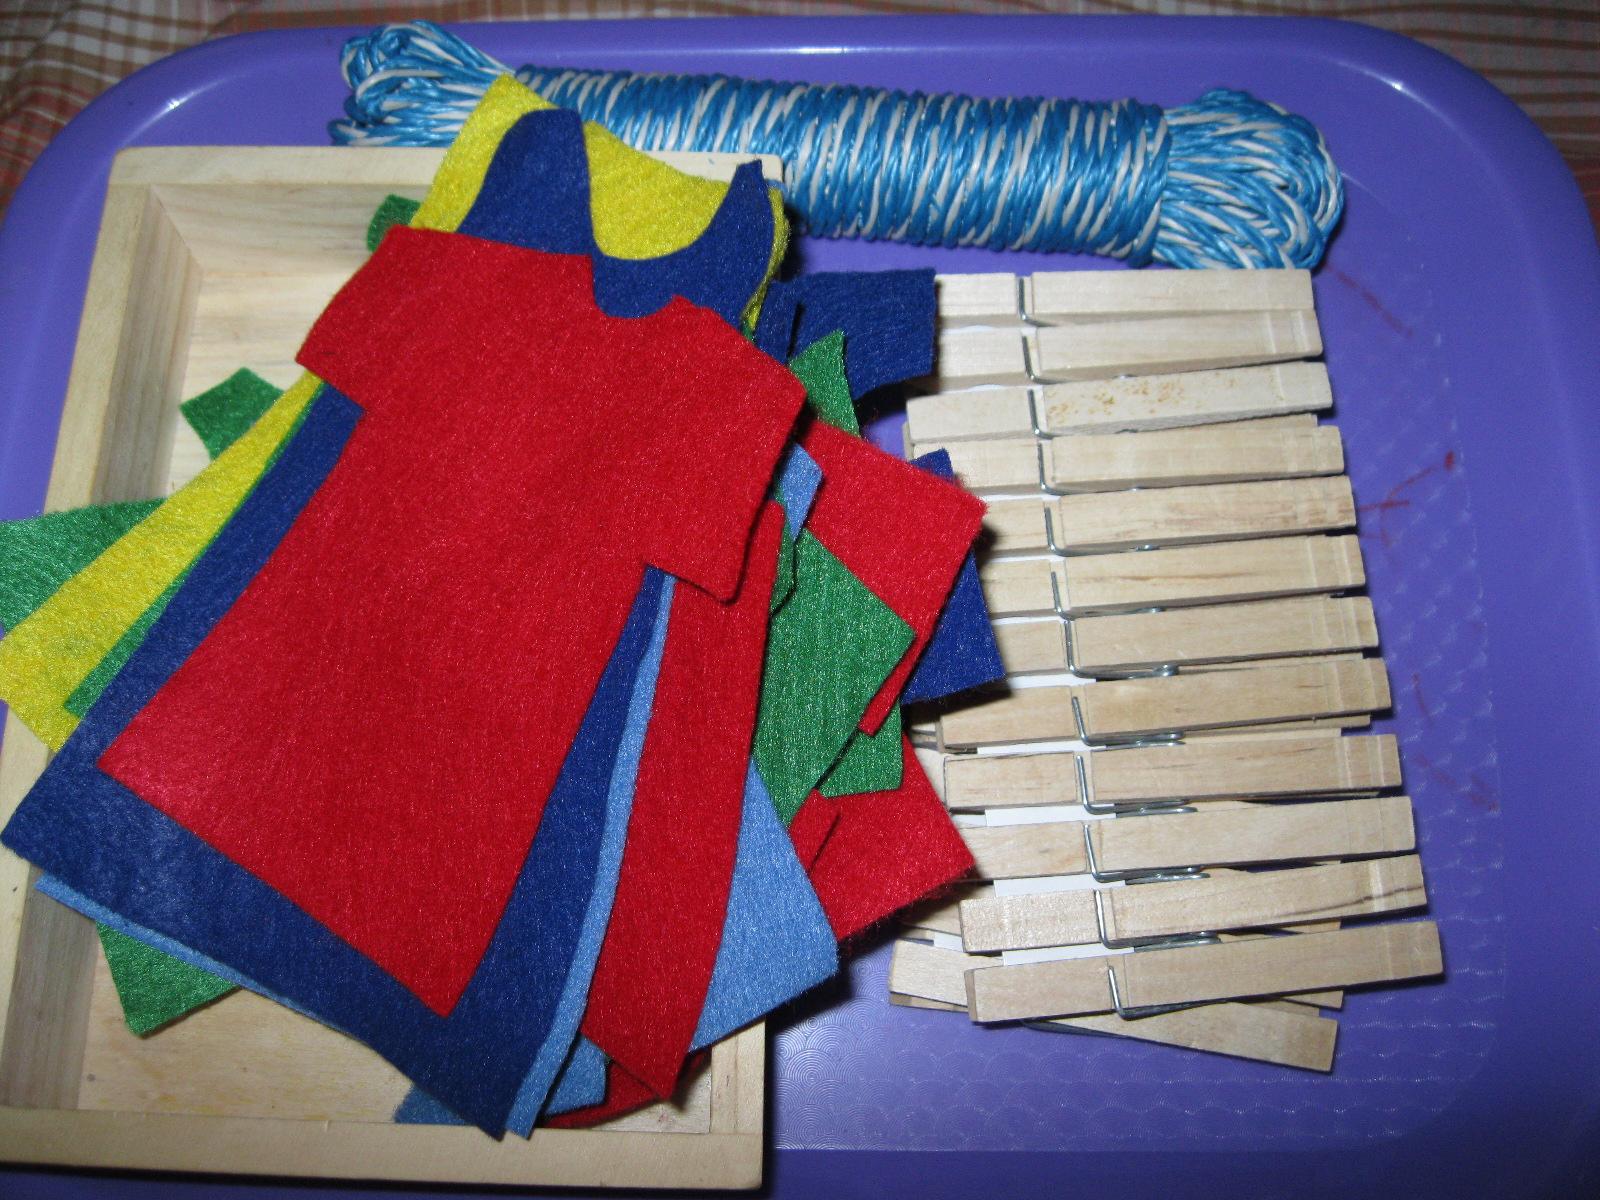 preschool clothing theme the preschool experiment tot trays laundry theme 338